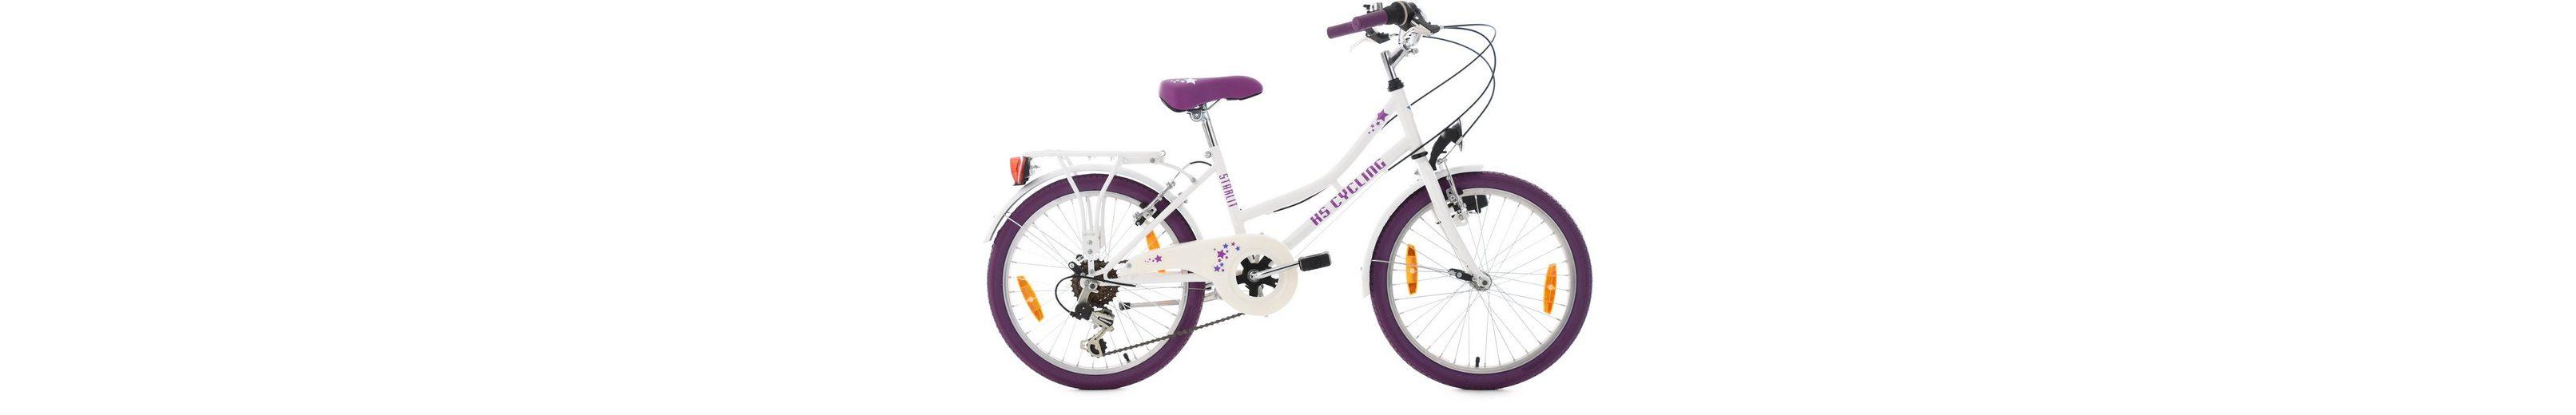 KS Cycling Jugendfahrrad, 20 Zoll, 6 Gang Shimano Kettenschaltung, »Starlit«